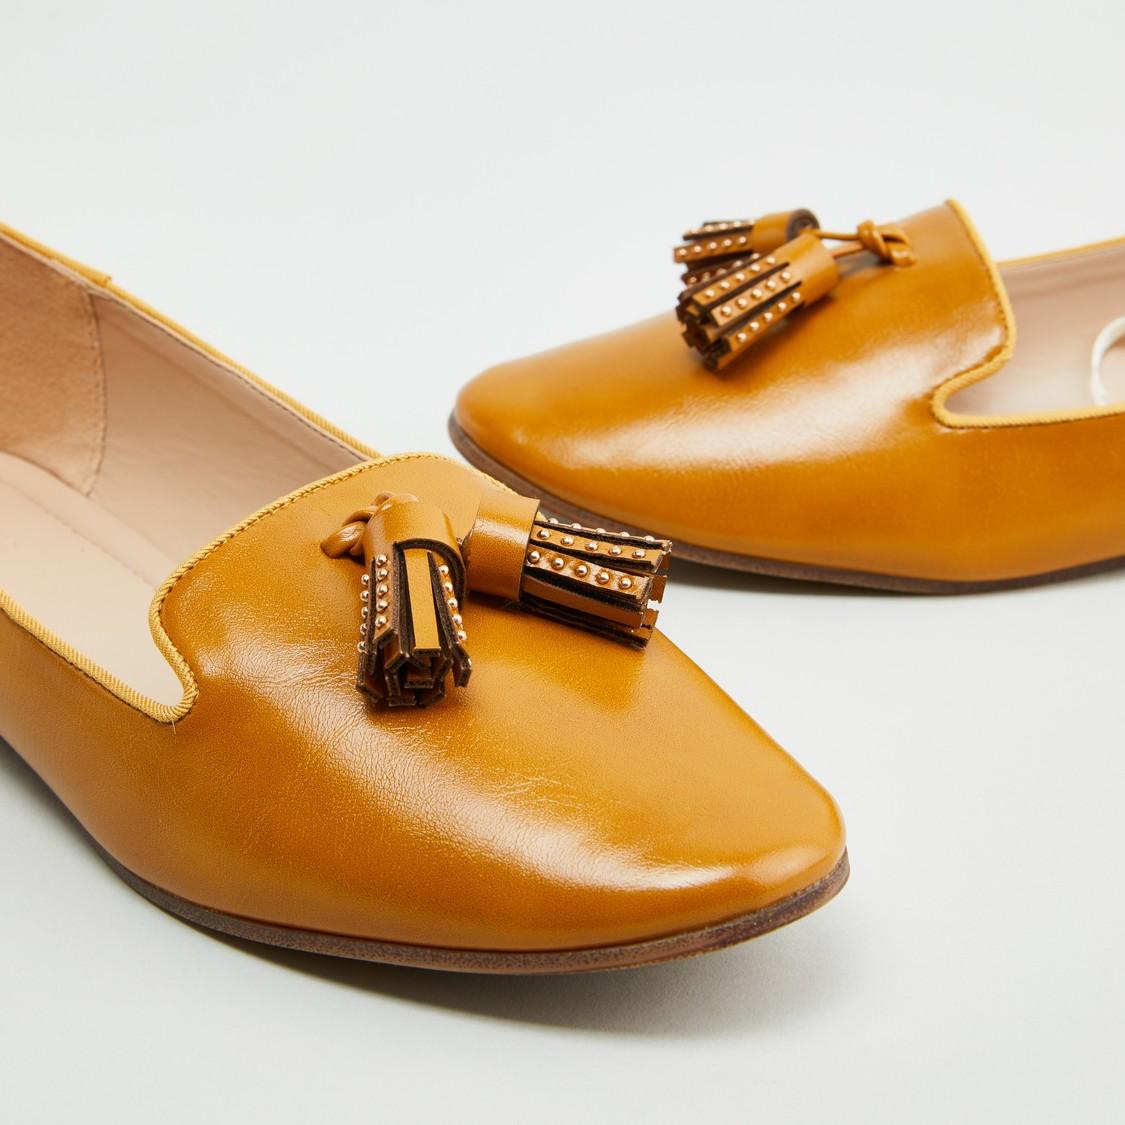 Embellished Slip-On Ballerinas with Tassel Detail